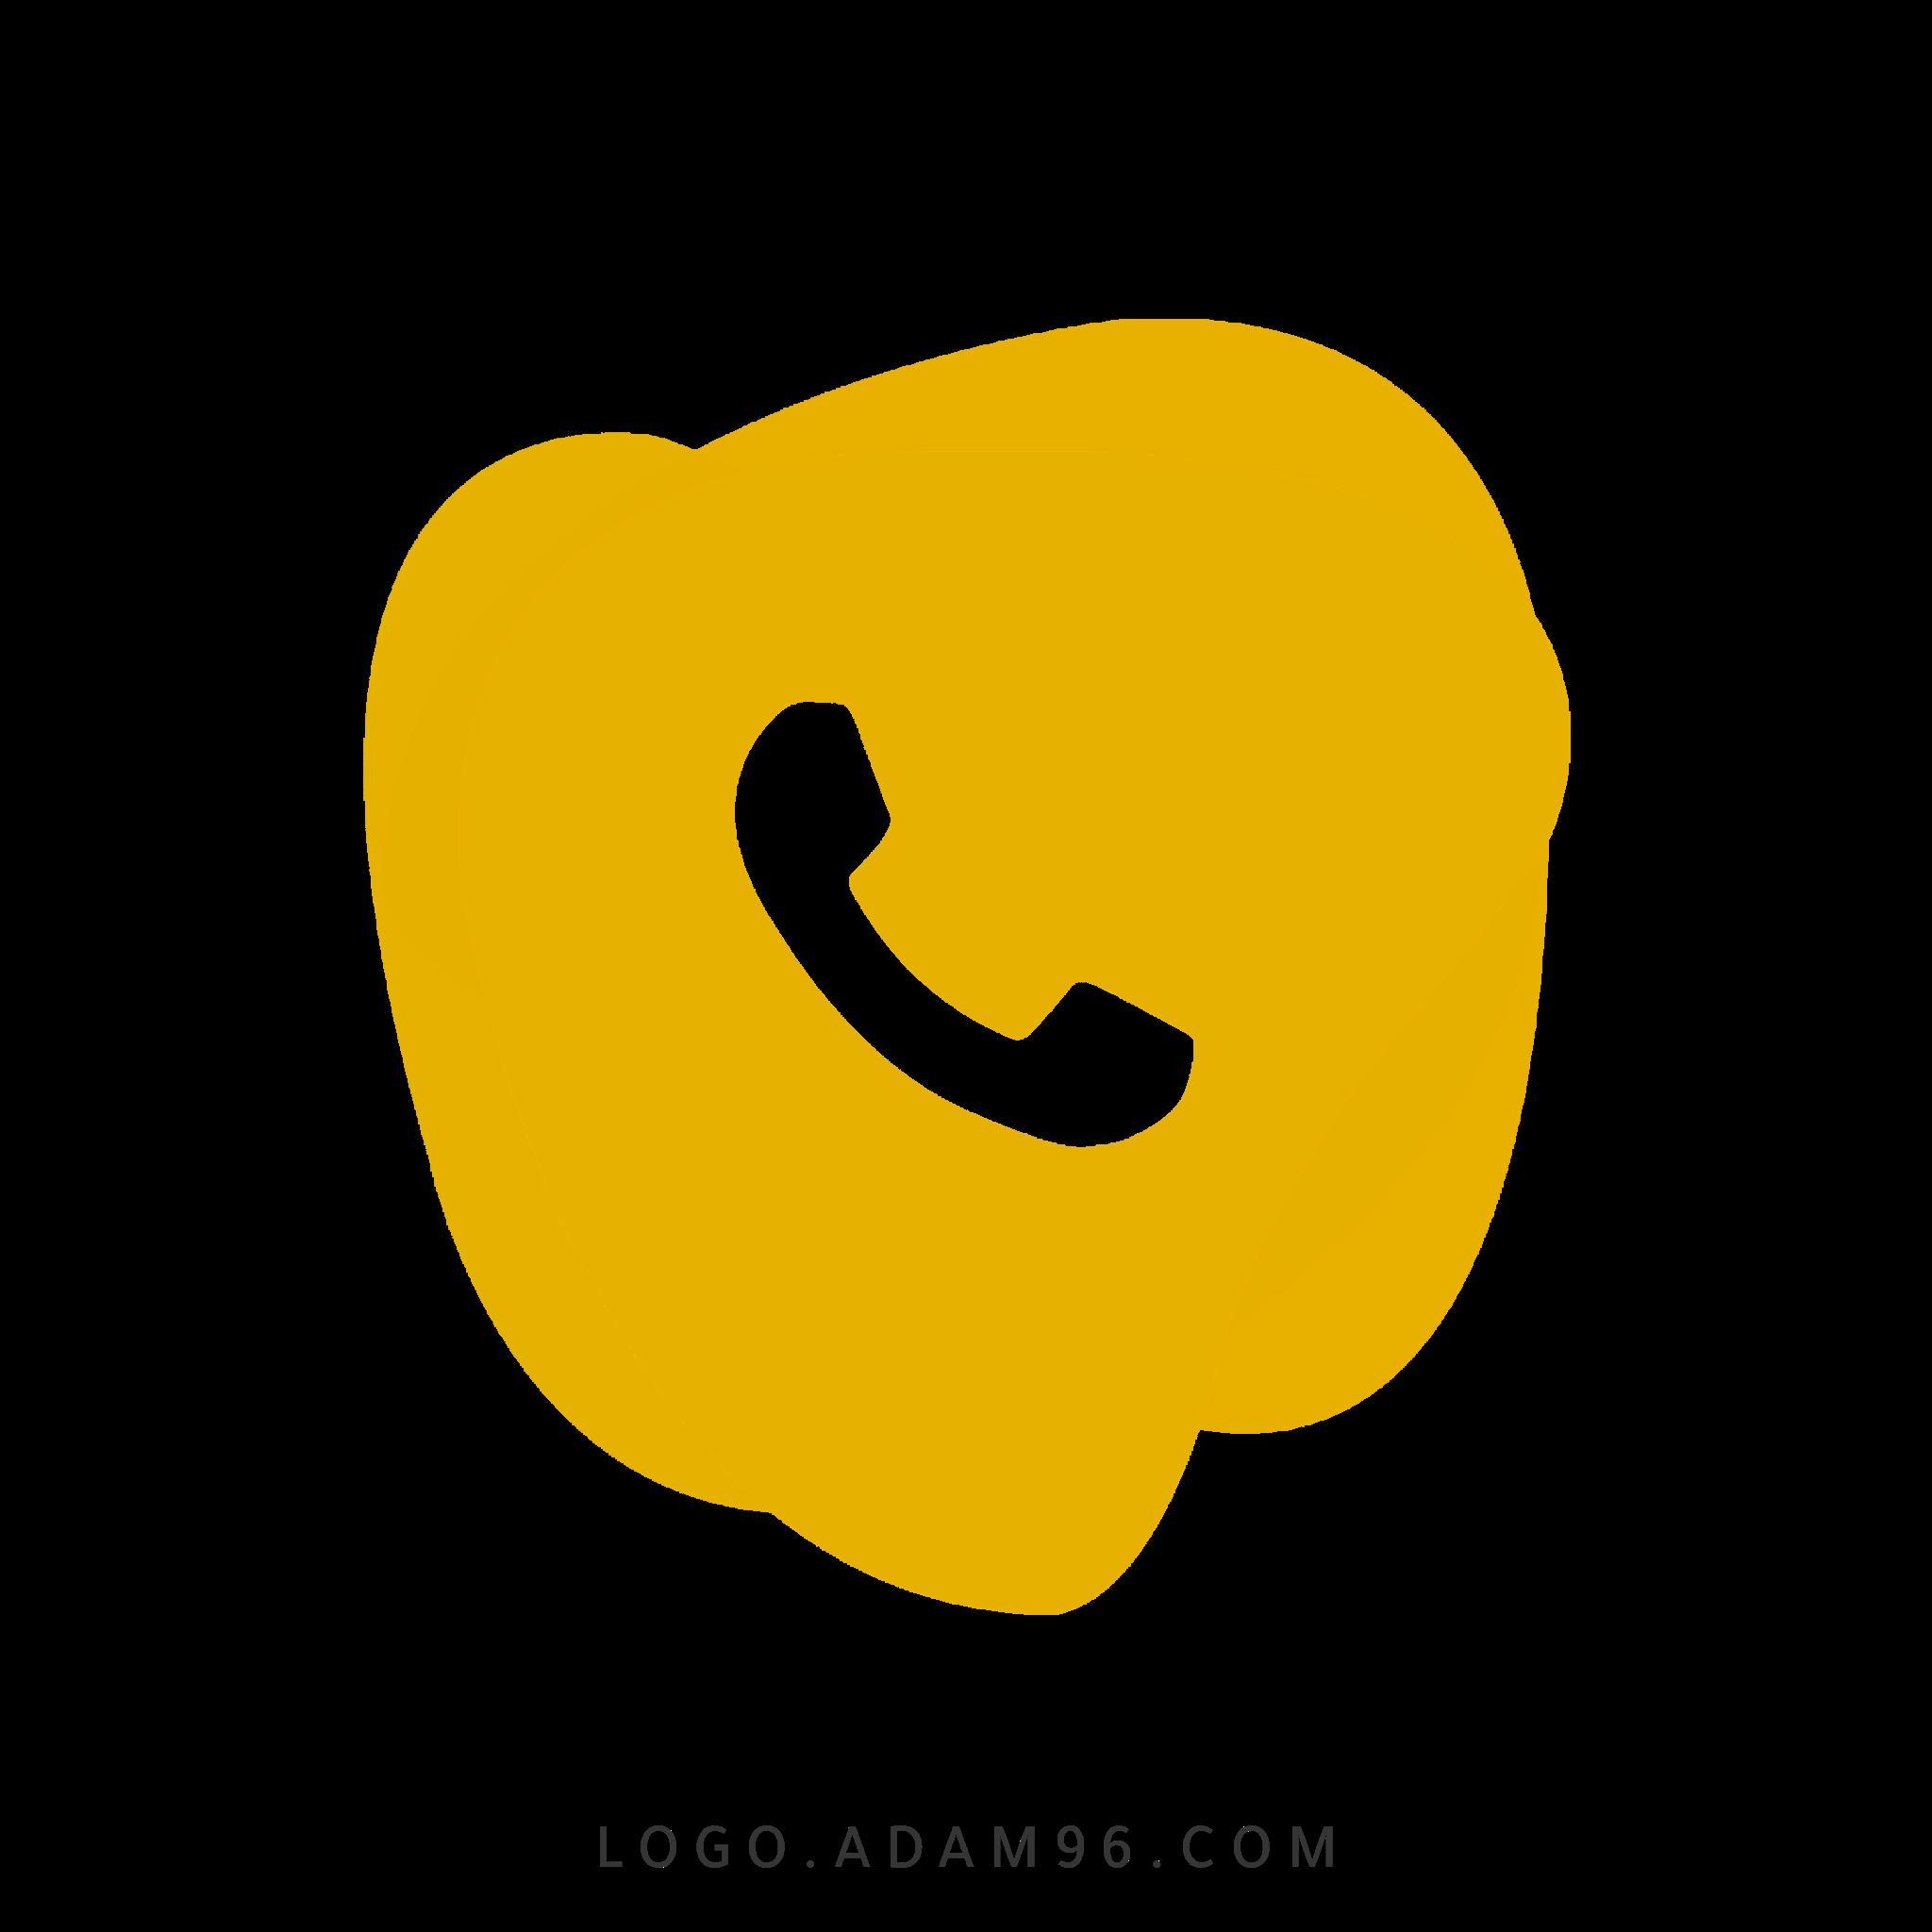 تحميل شعار واتساب احترافي بـ 3 الوان لوجو واتساب بجودة عالية Logo Whatsapp PNG